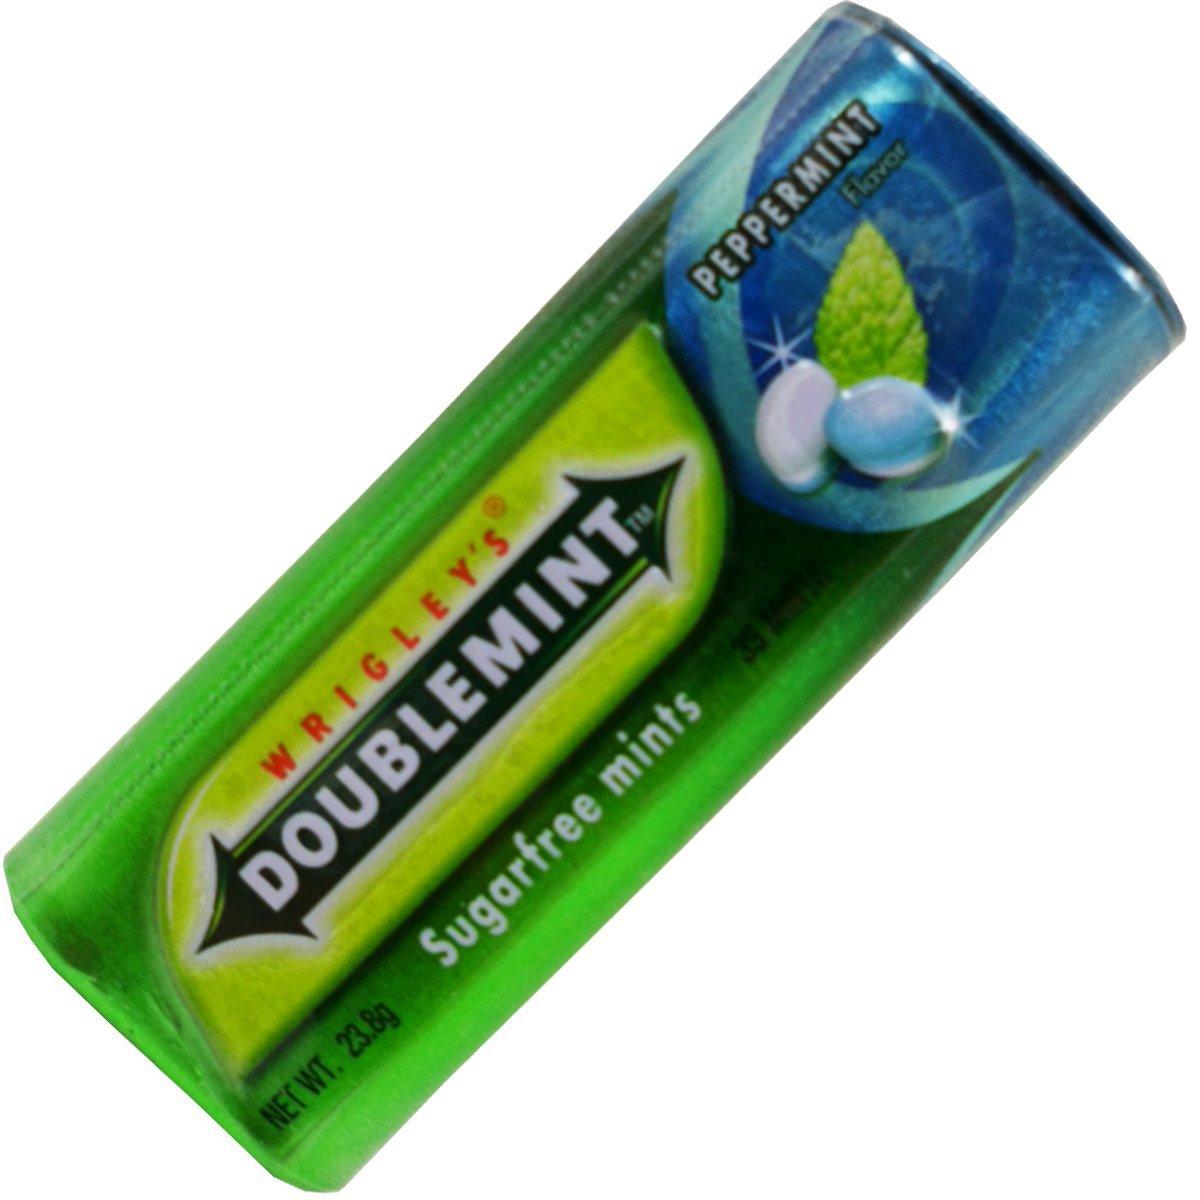 Wrigleys Doublemint Candy Peppermint Flavor Sugar Free Net Wt 23.8 G